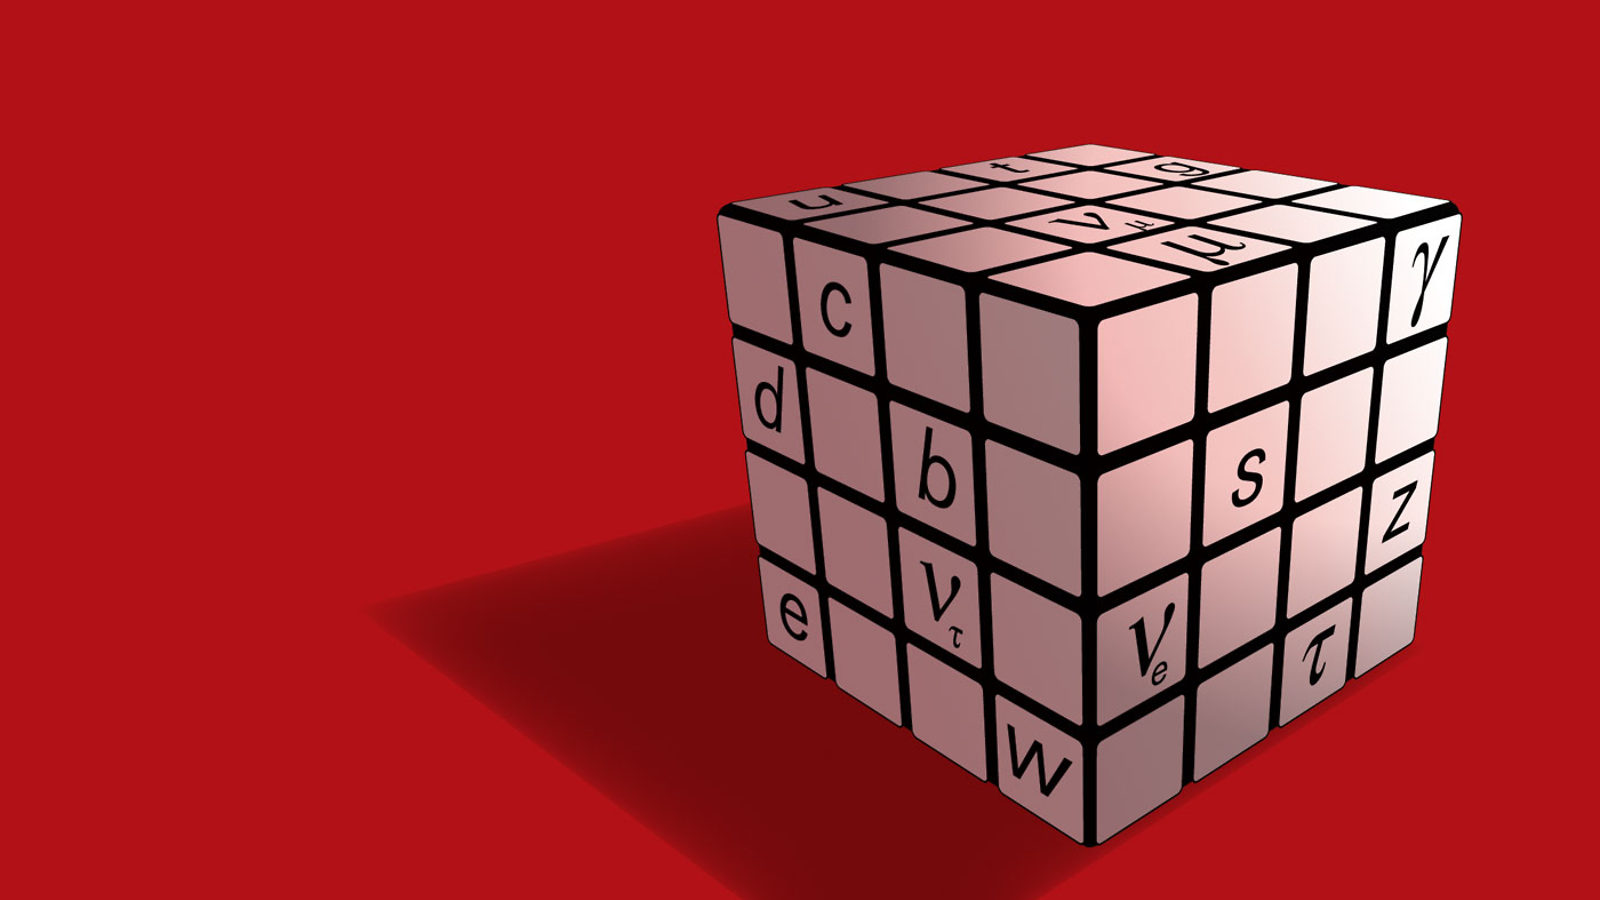 Image: Standard Model Cube